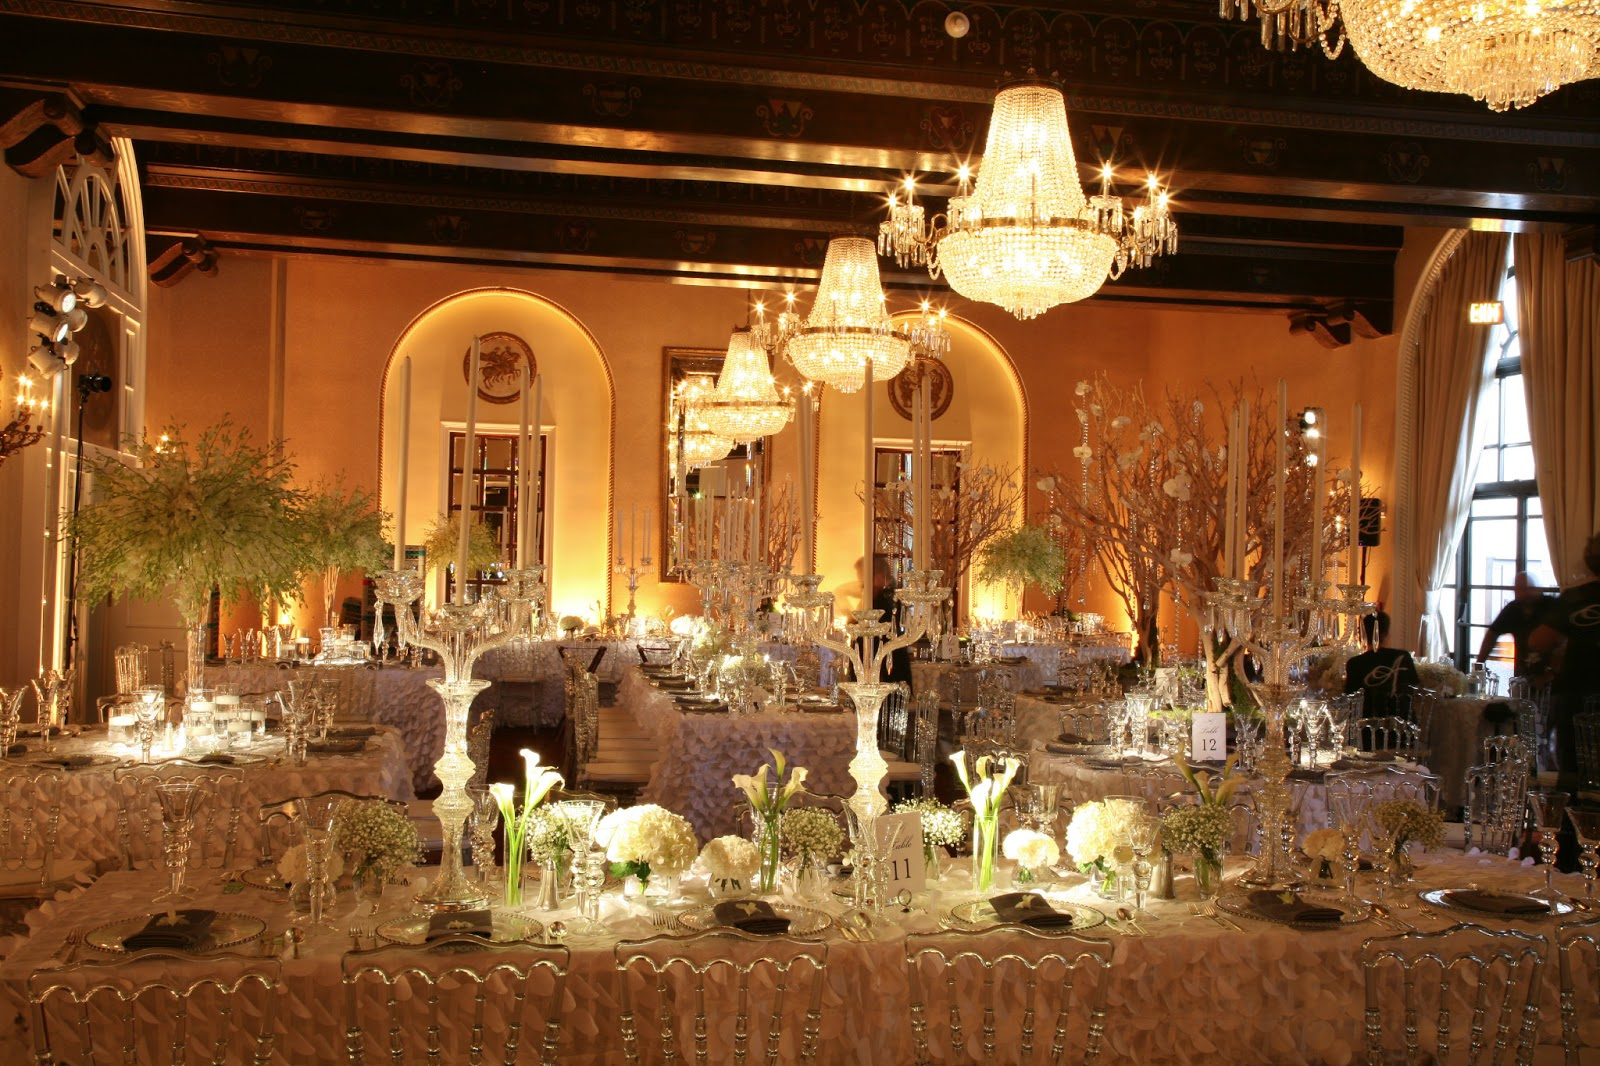 bridal bubbly dc wedding venues small hotels On dc wedding venues